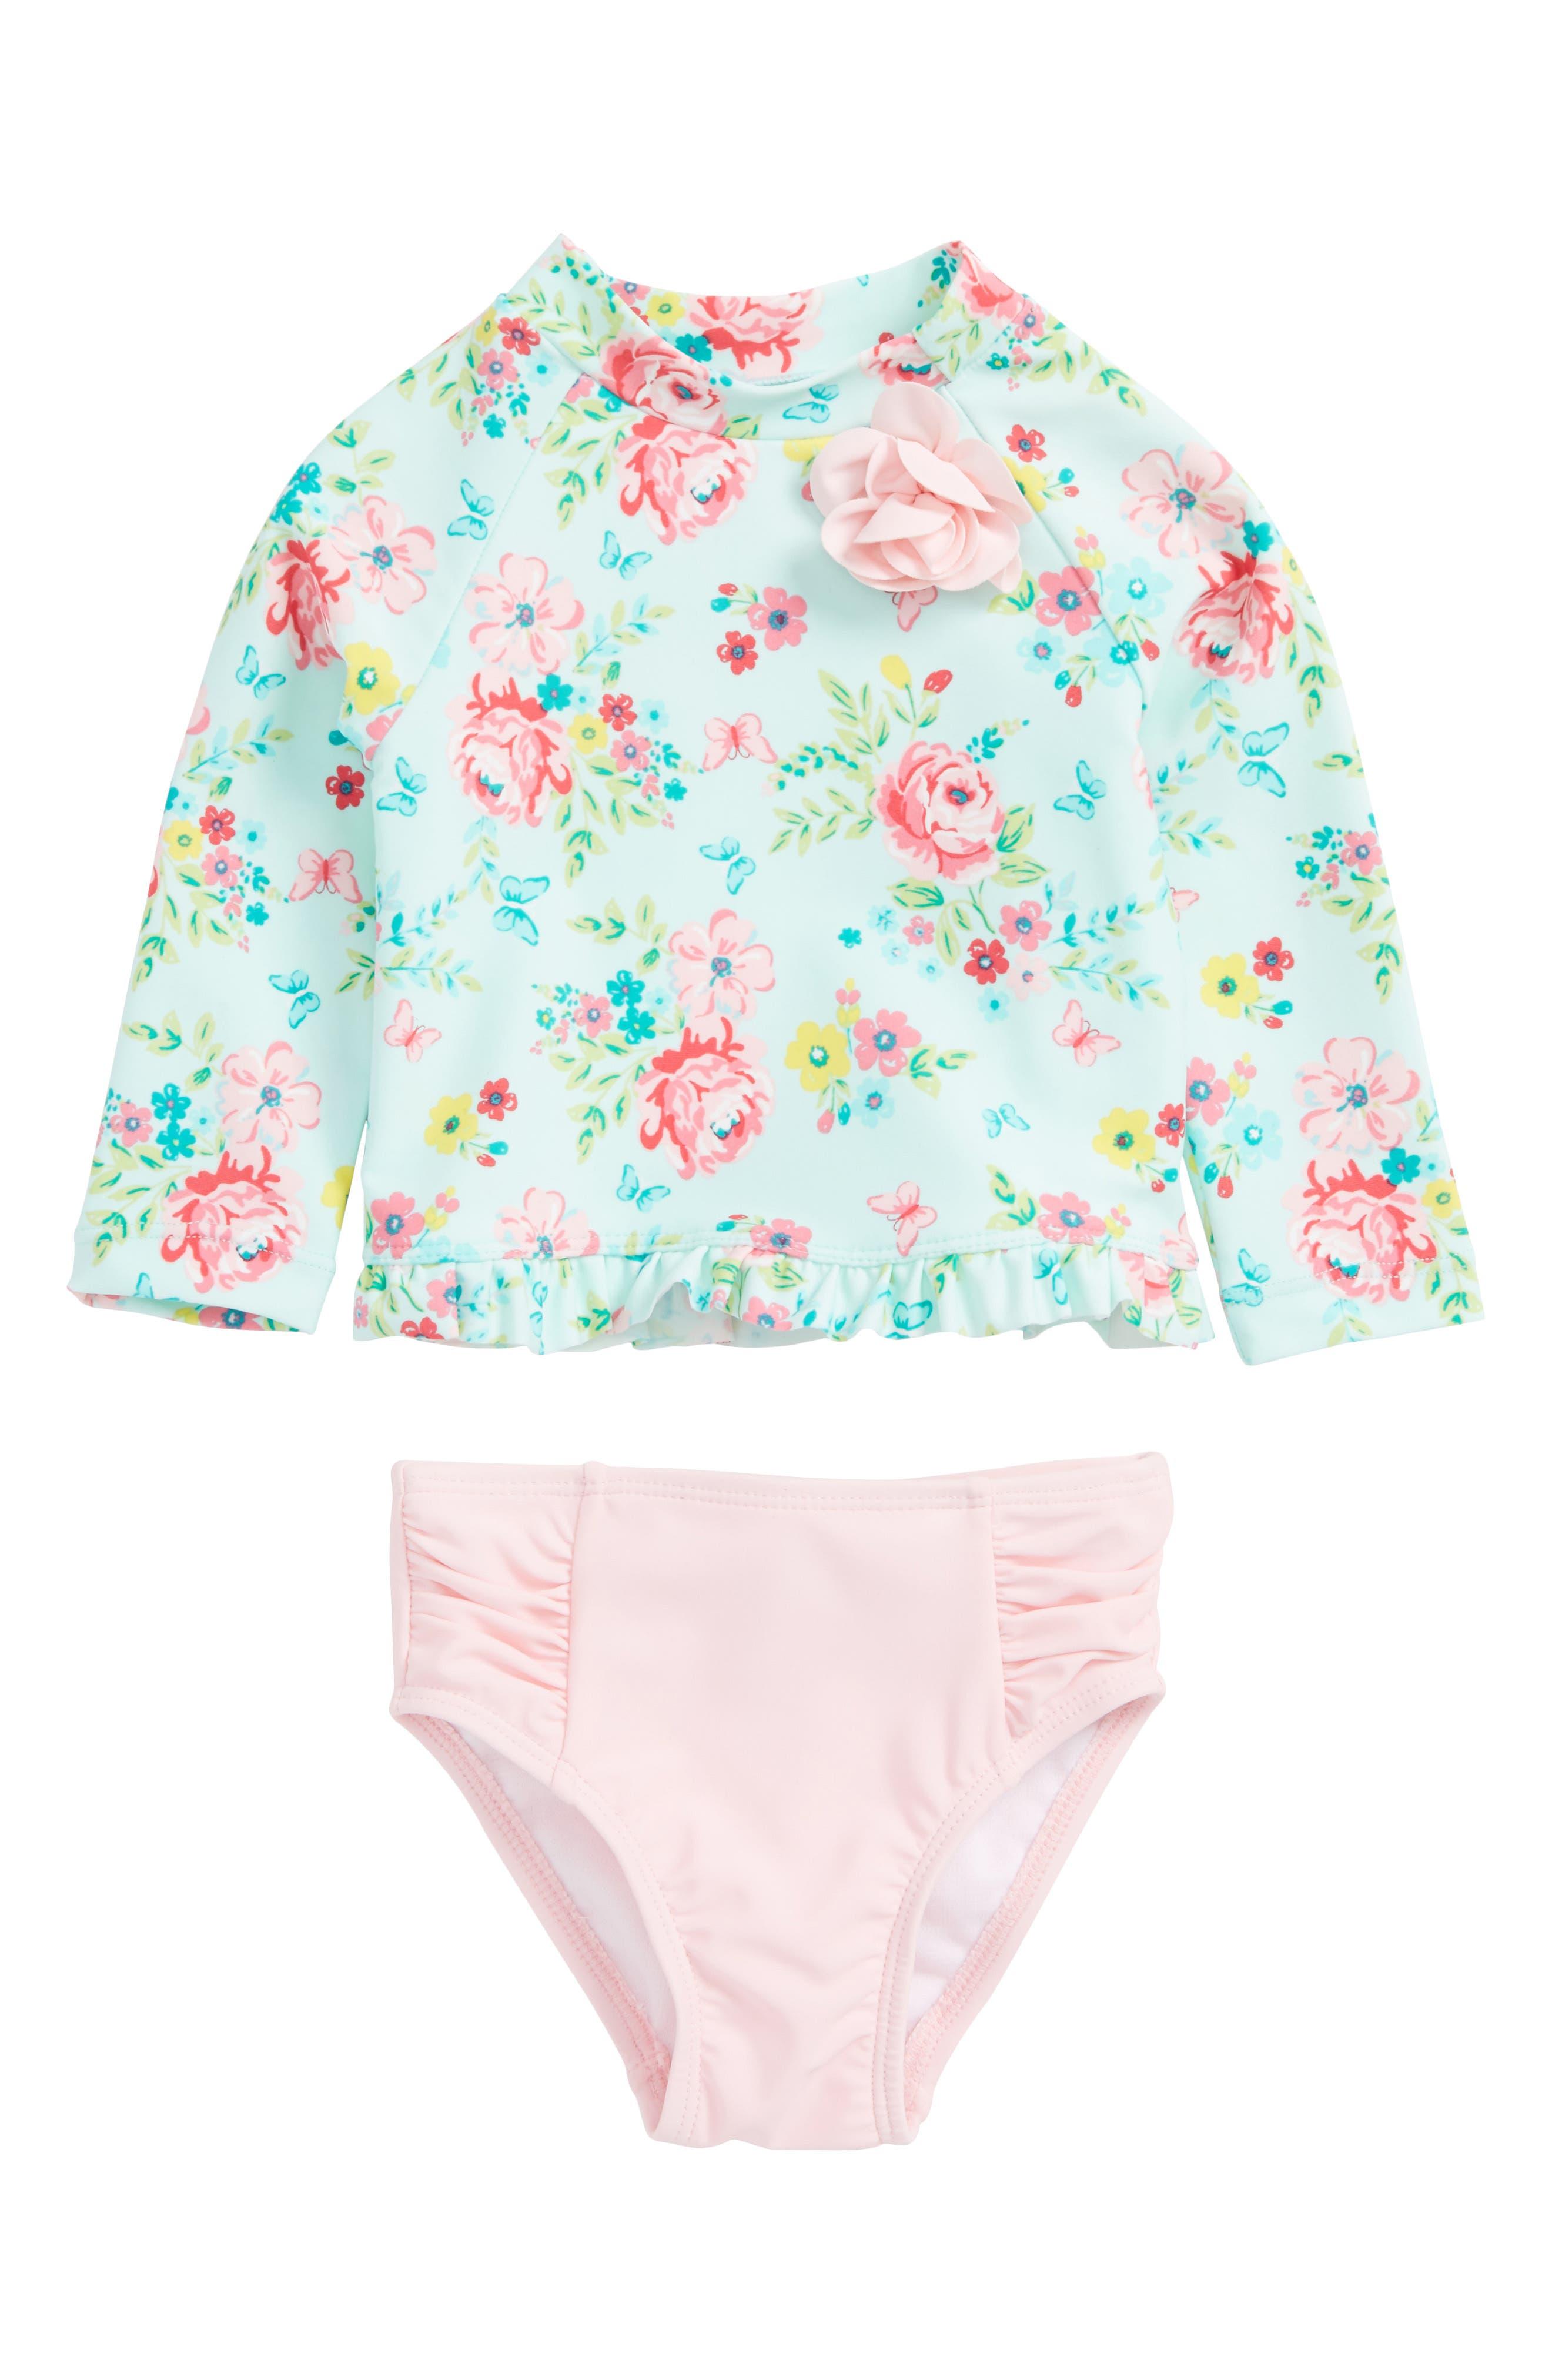 Aqua Rose Two-Piece Rashguard Swimsuit,                         Main,                         color, Seafoam